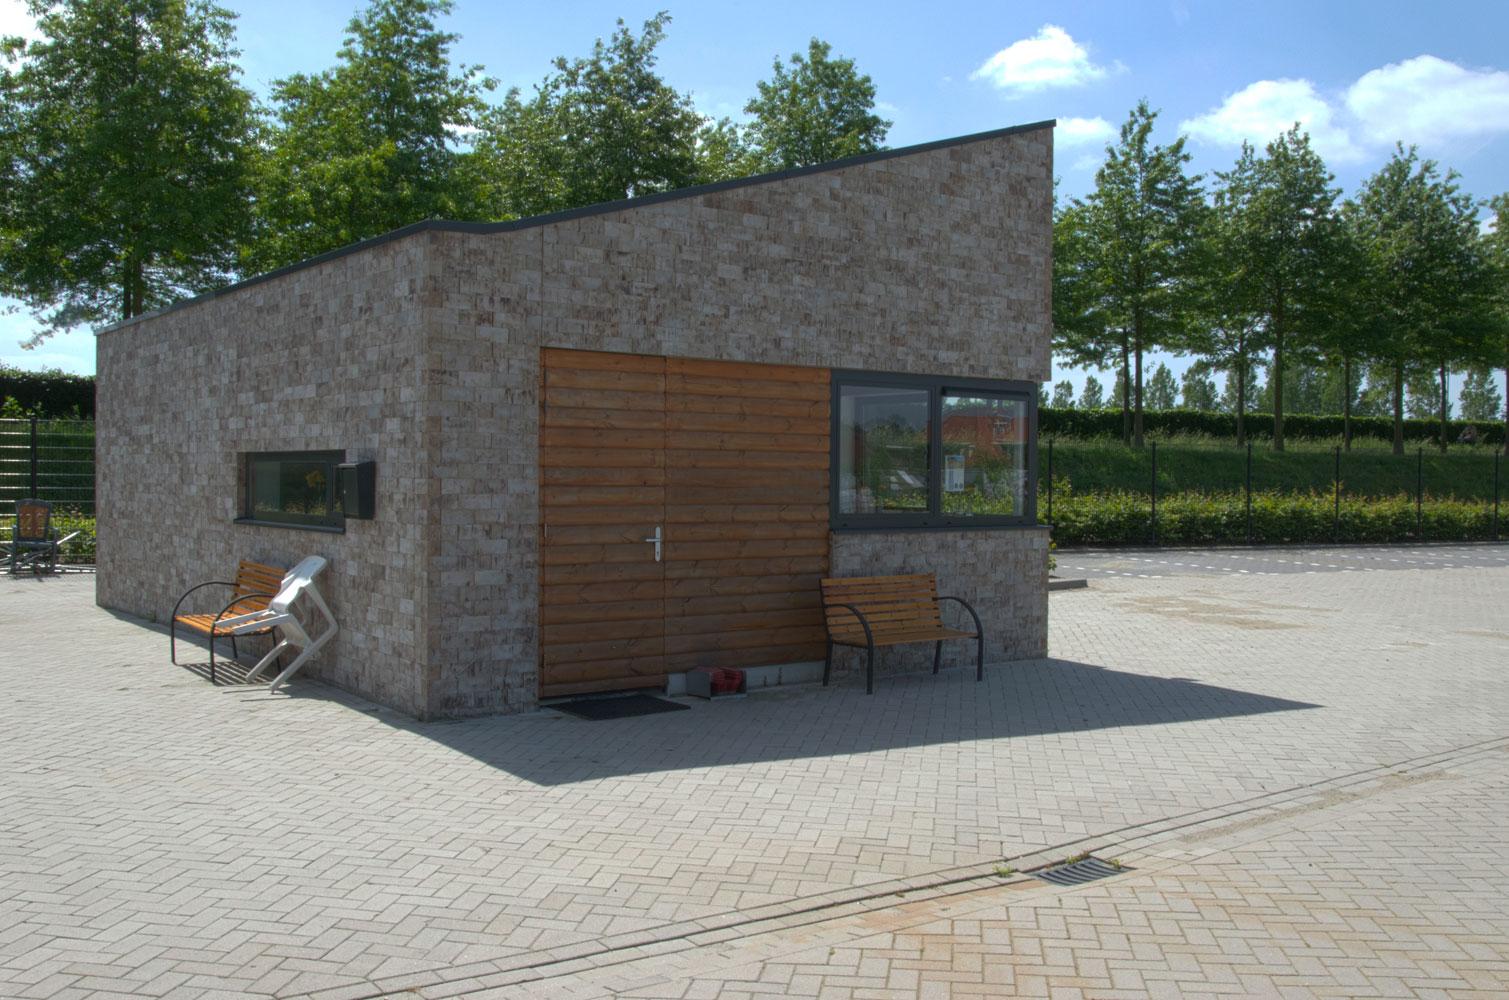 00712ext4 Volkstuinencomplex Etten-Leur